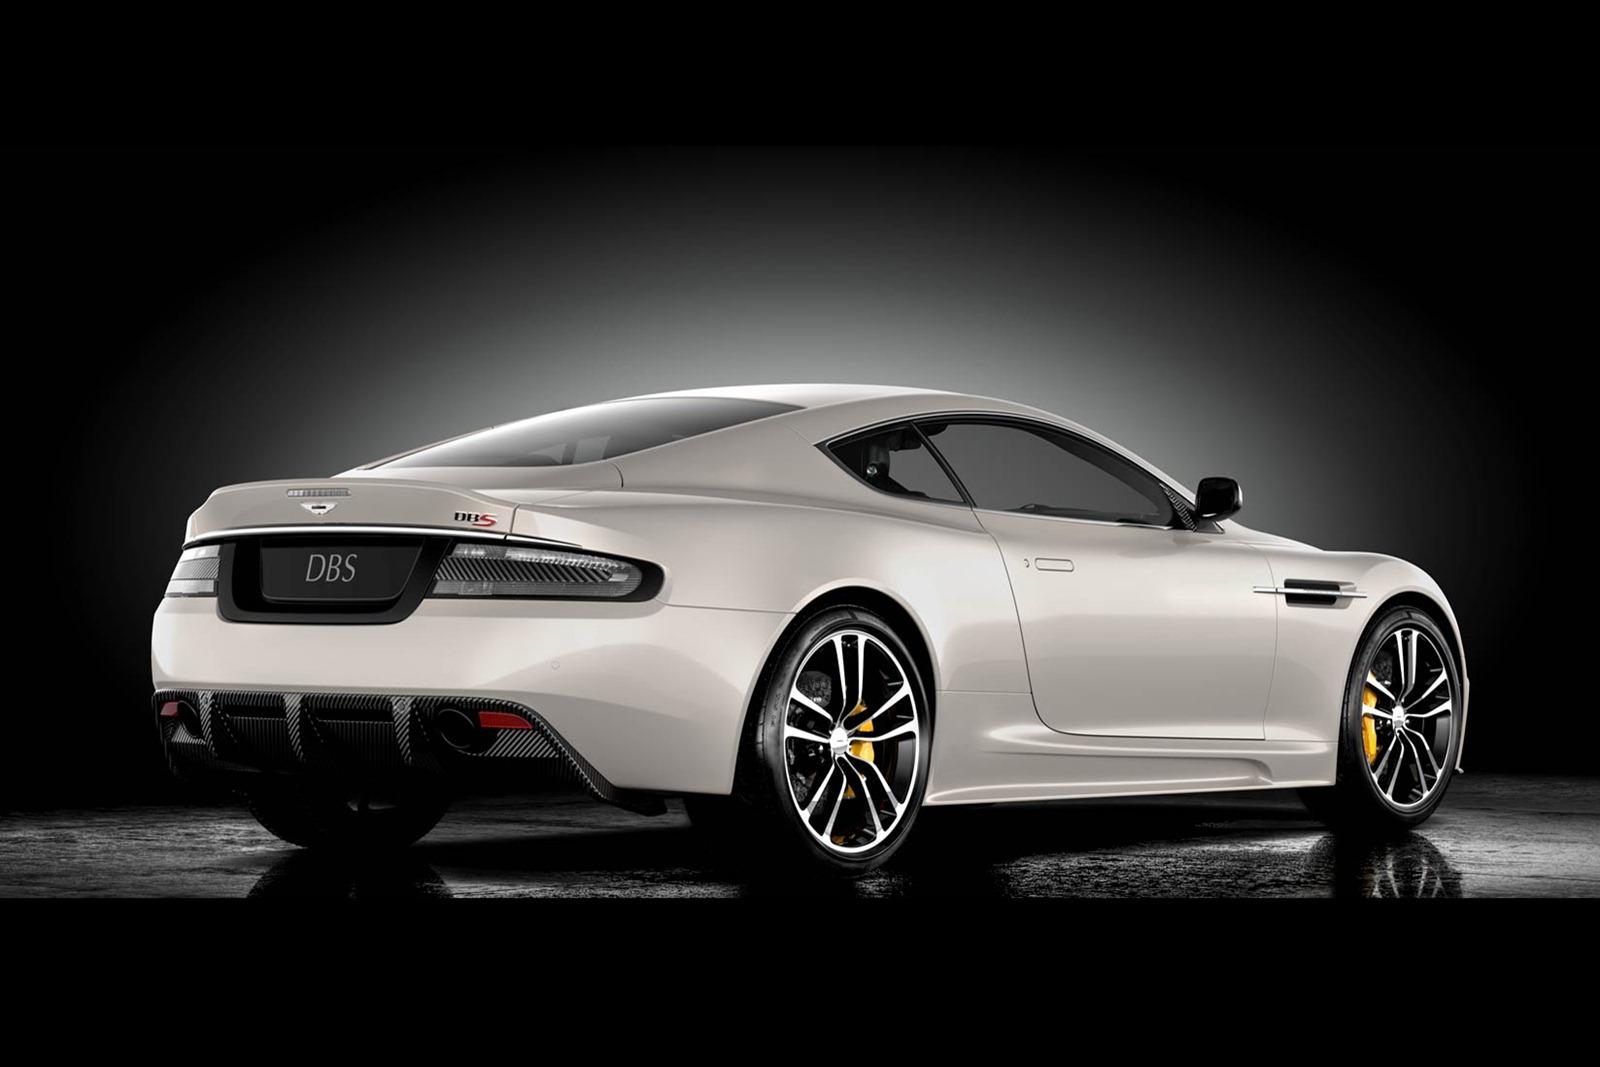 Aston Martin DBS2